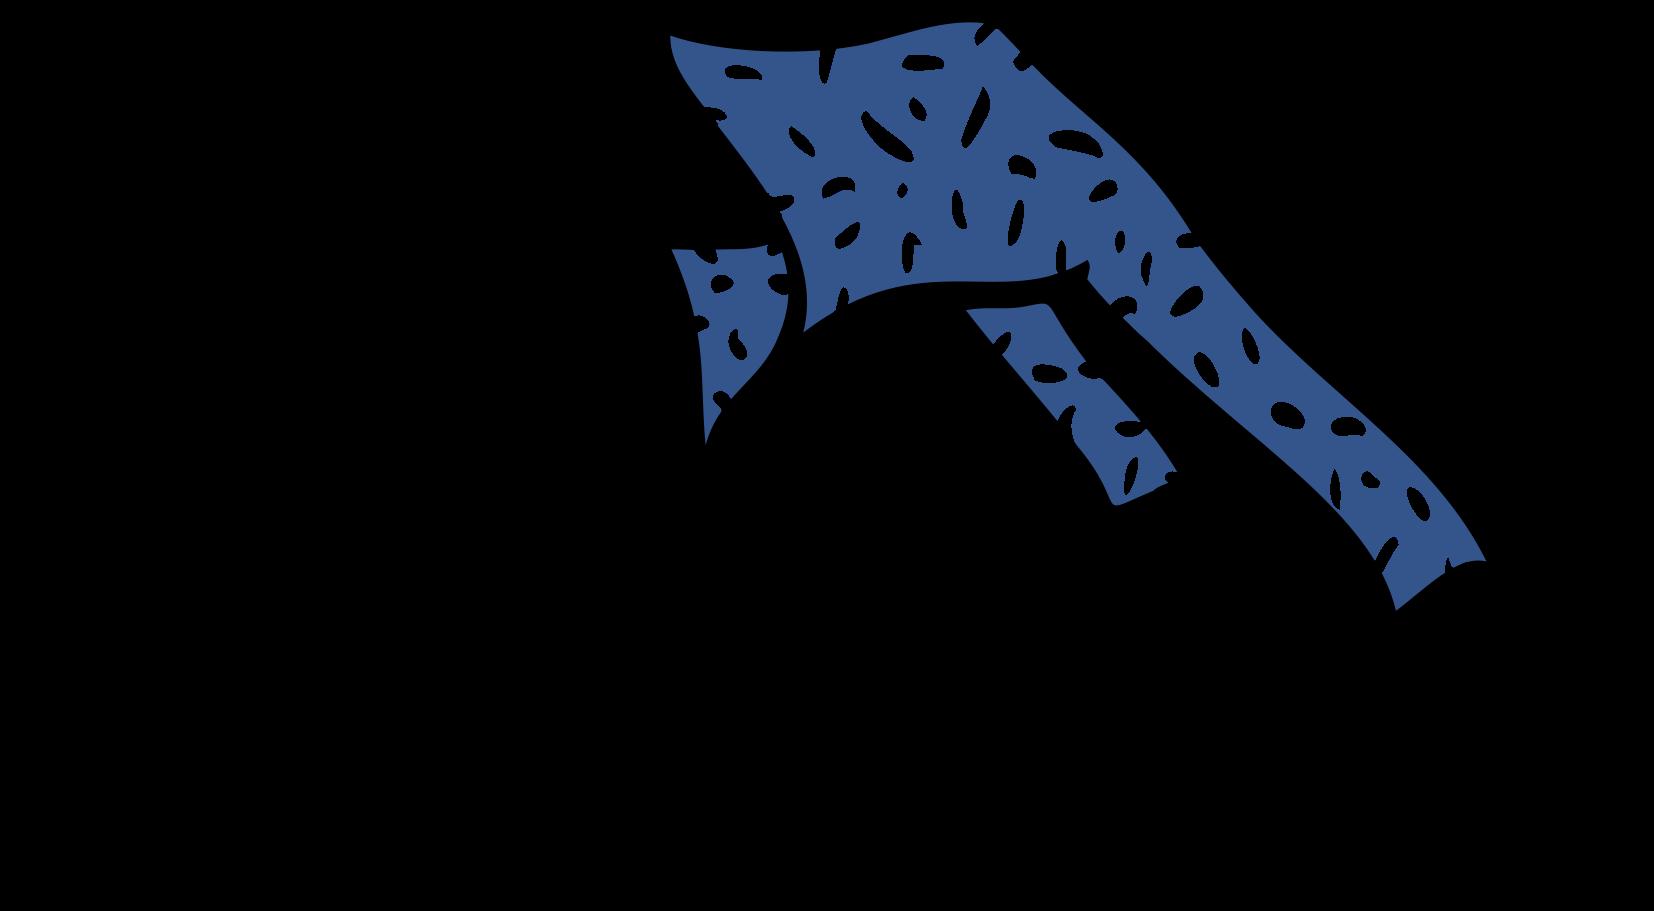 Levitate Clipart illustration in PNG, SVG